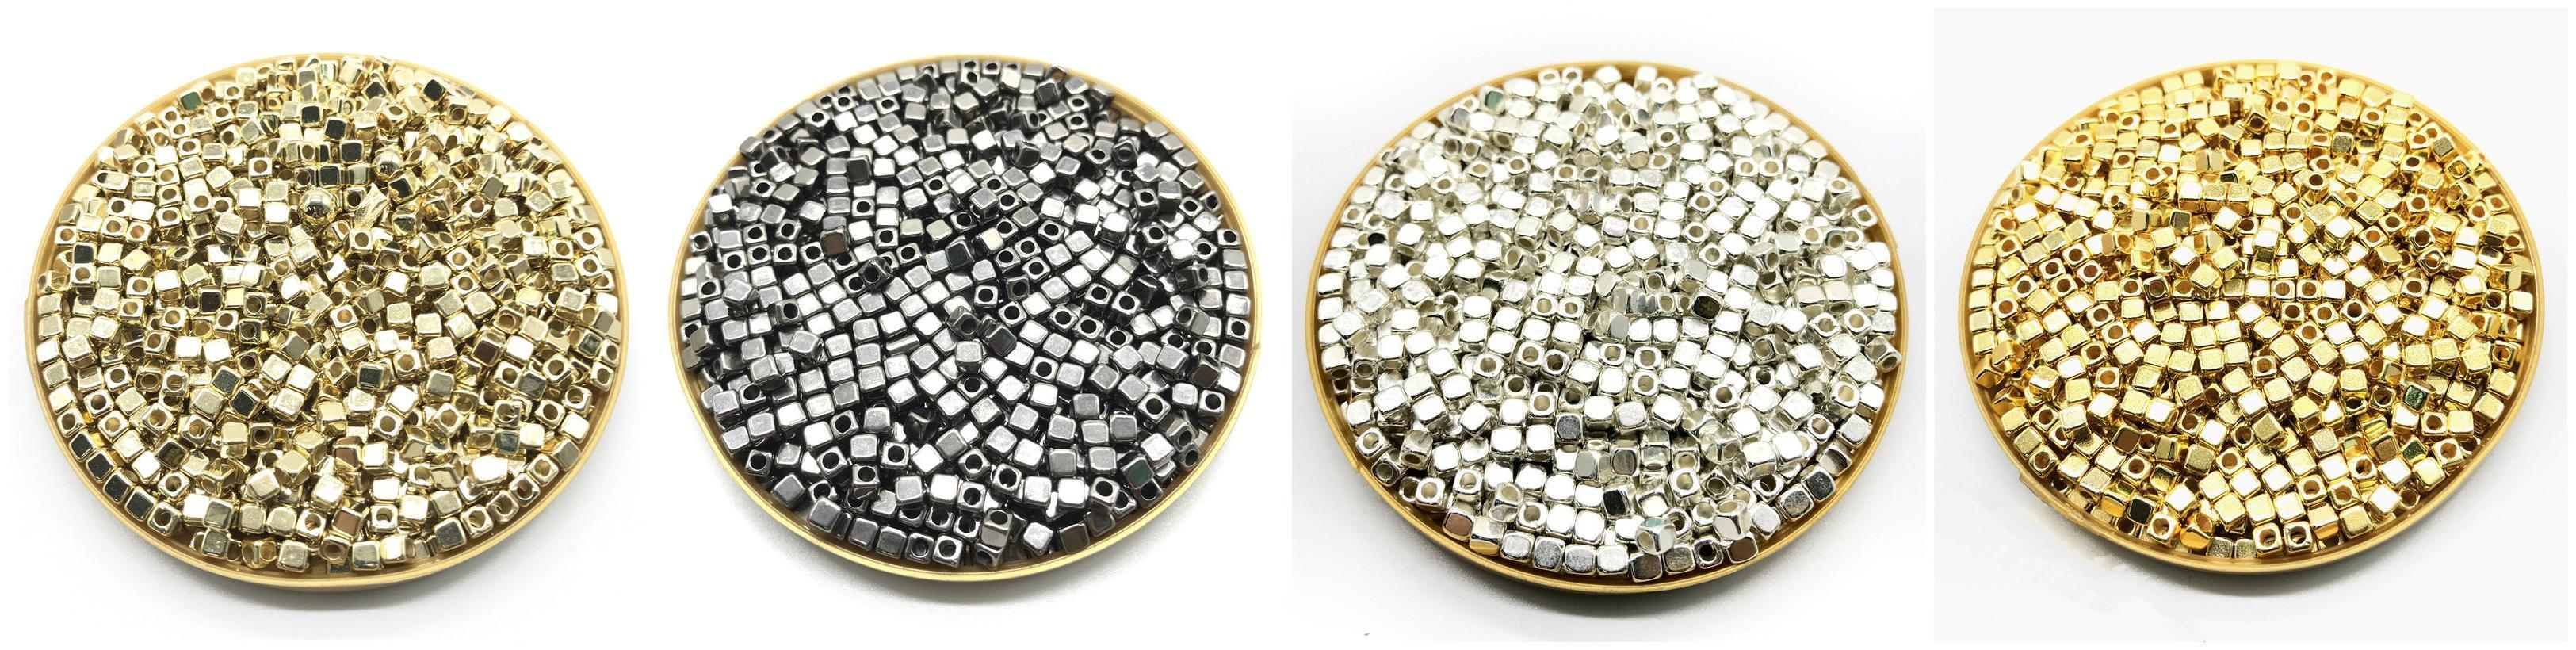 200Pcs Acrylic Plated CCB <font><b>Beads</b></font> for DIY